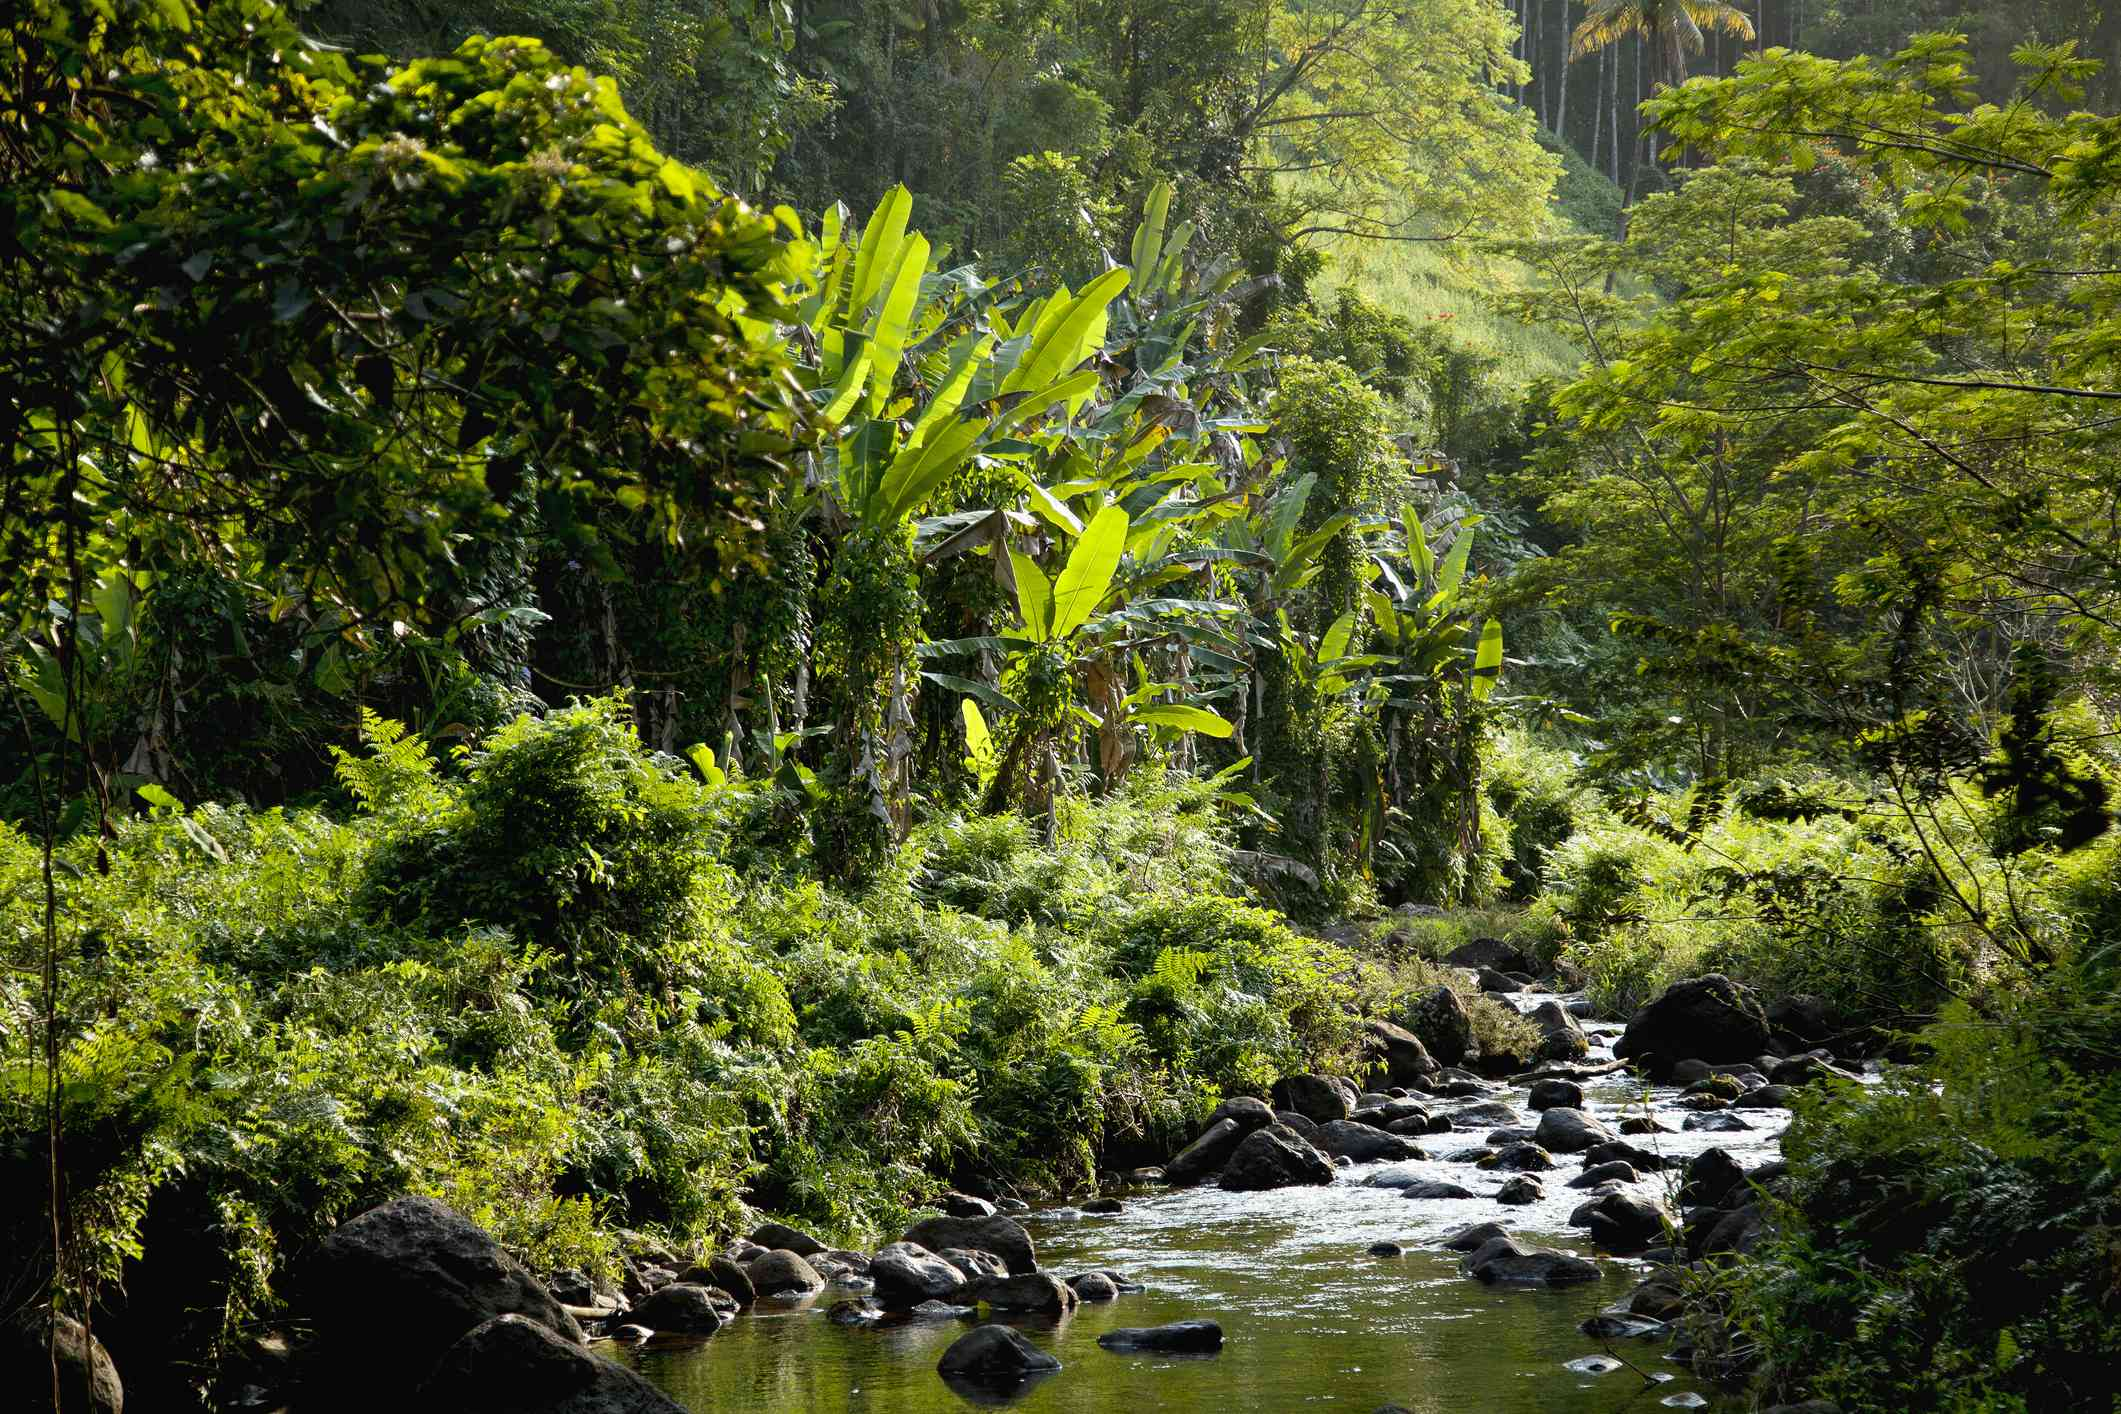 Creek running through the tropical landscape of Hakalau Forest